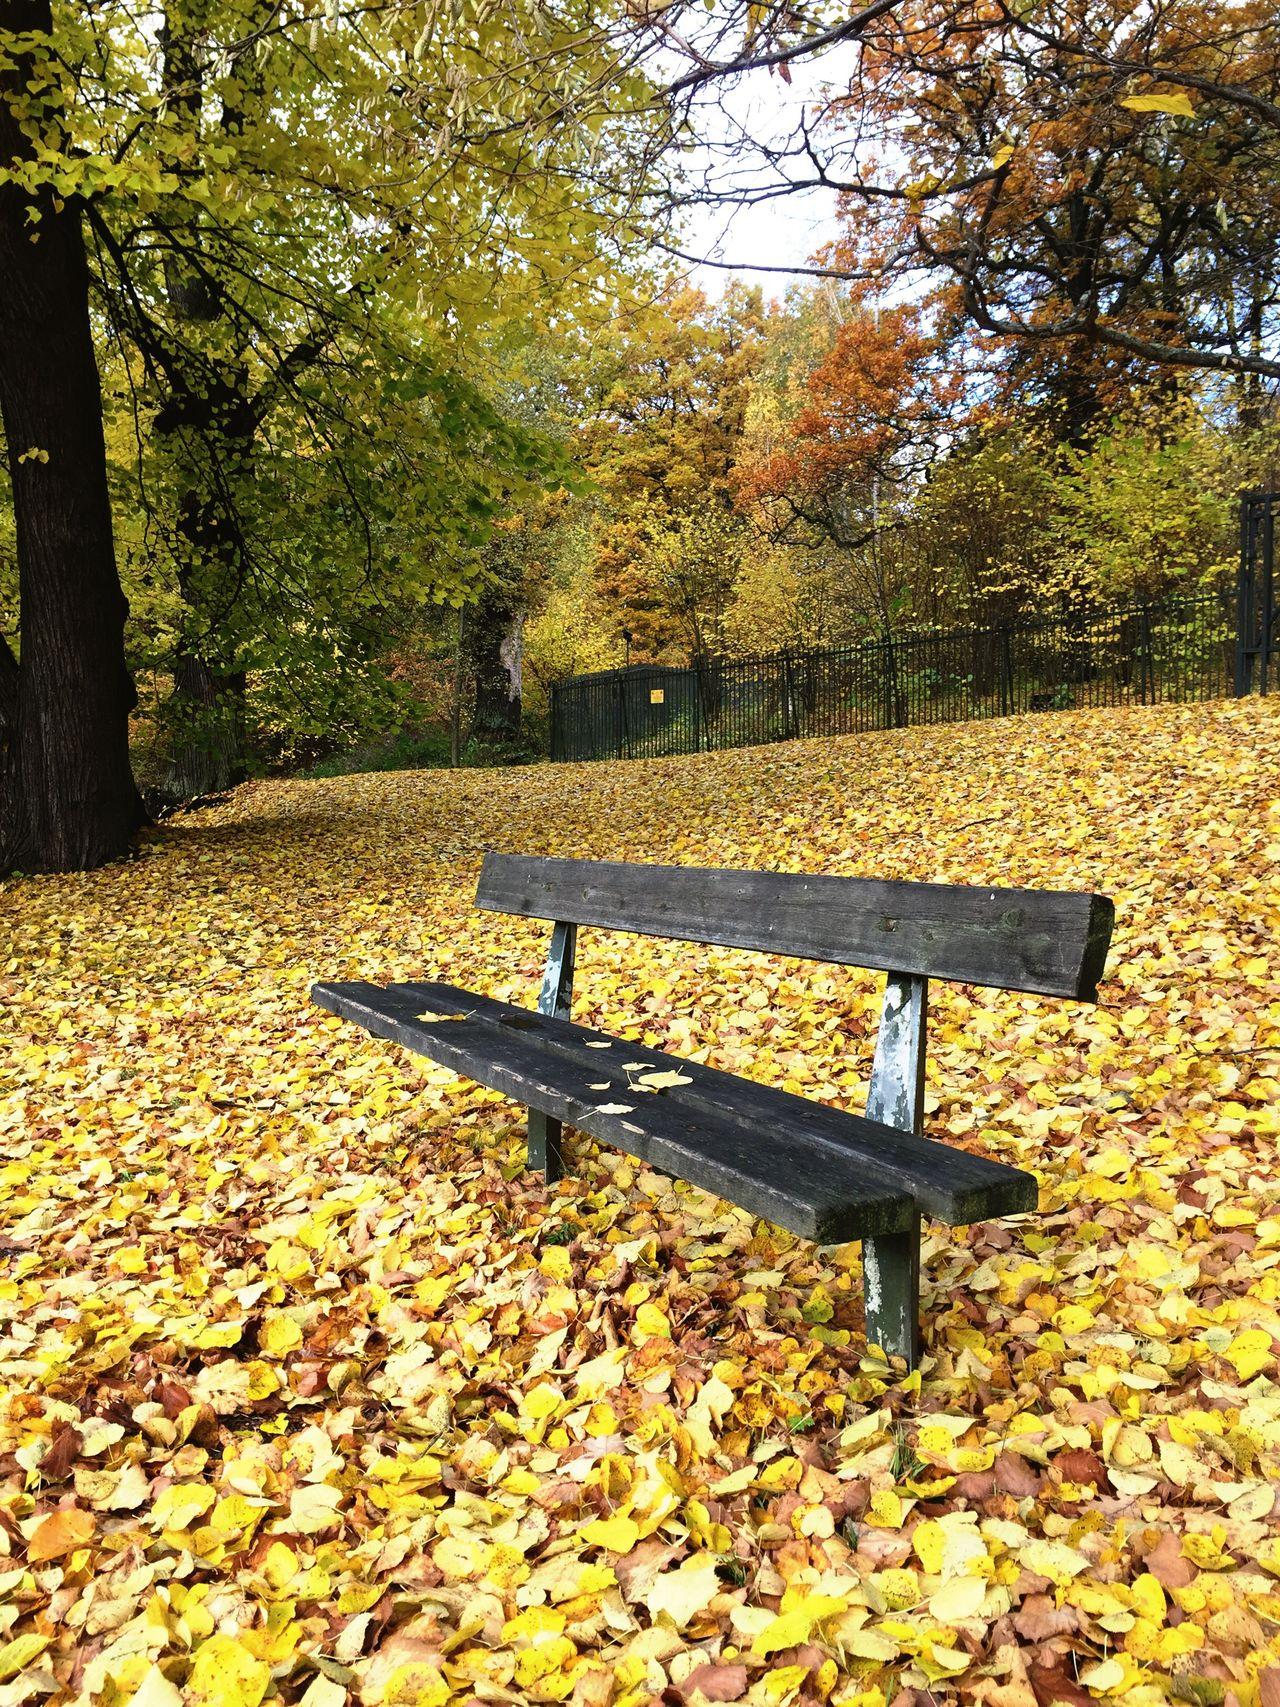 Sweden Autumn Nature Beauty In Nature Naturelovers Bankinthenature Park - Man Made Space Bank Lonely Thinking Thinking About Life Yellow Pleasebuyineedthemoney Pleasebuymyphoto Buythisone Buying Equipment